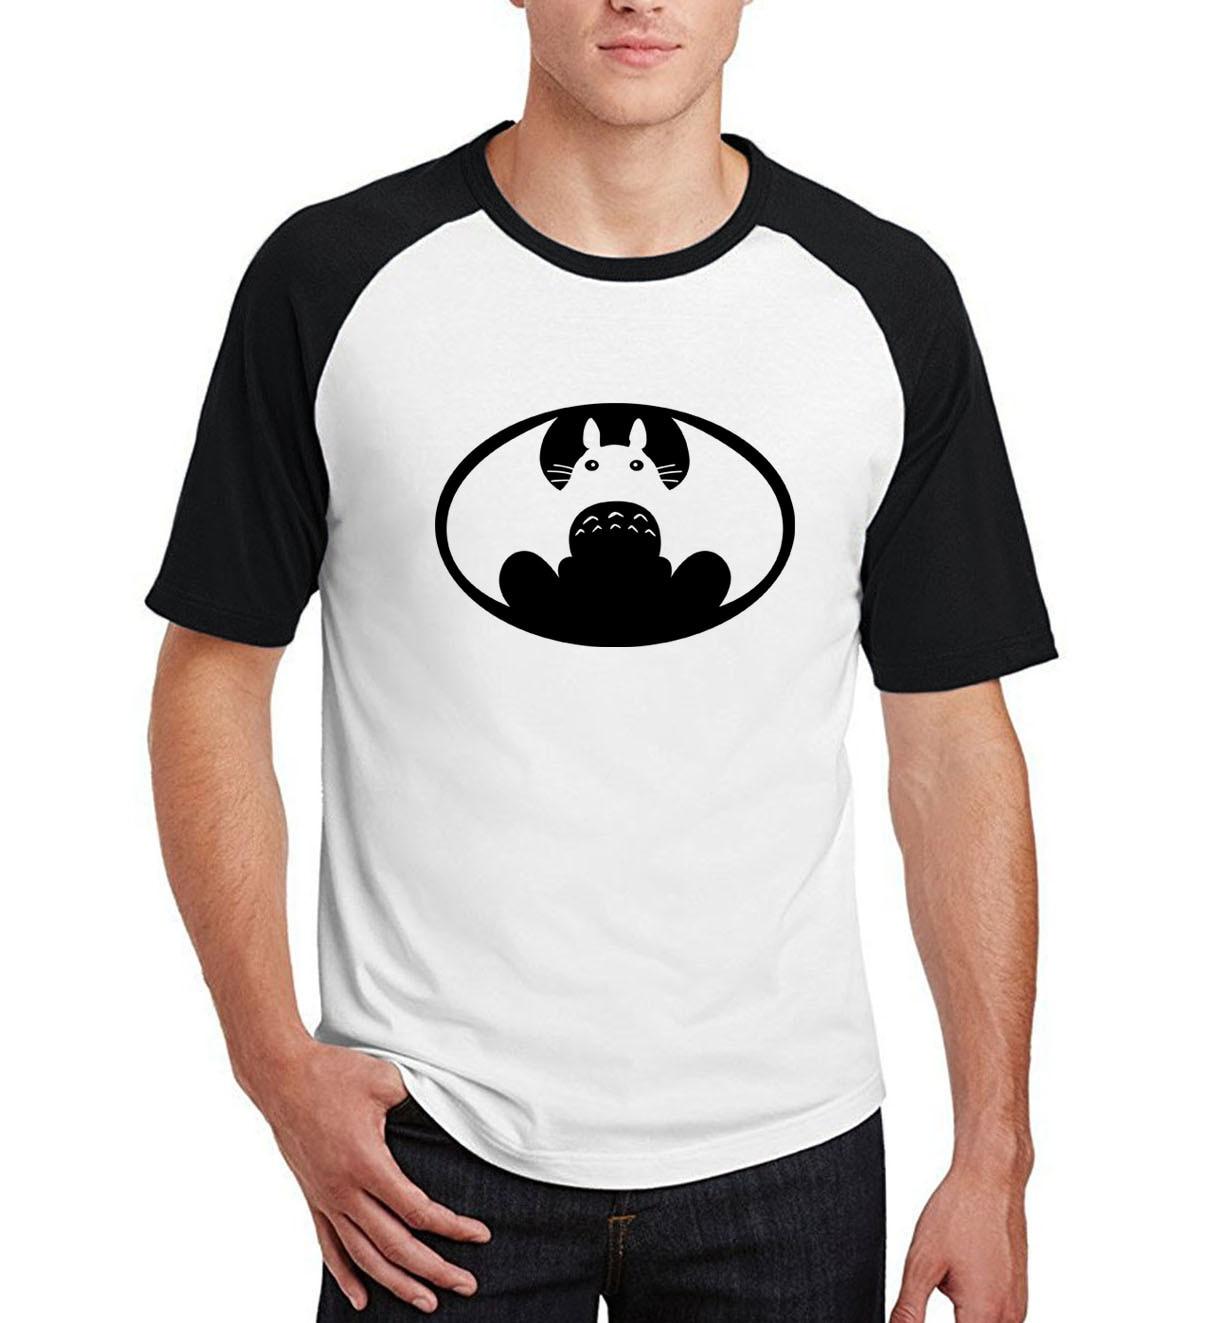 2019 novelty  funny harajuku raglan sleeves t-shirts hipster short sleeve o-neck tops funny hot sale cotton t shirts men